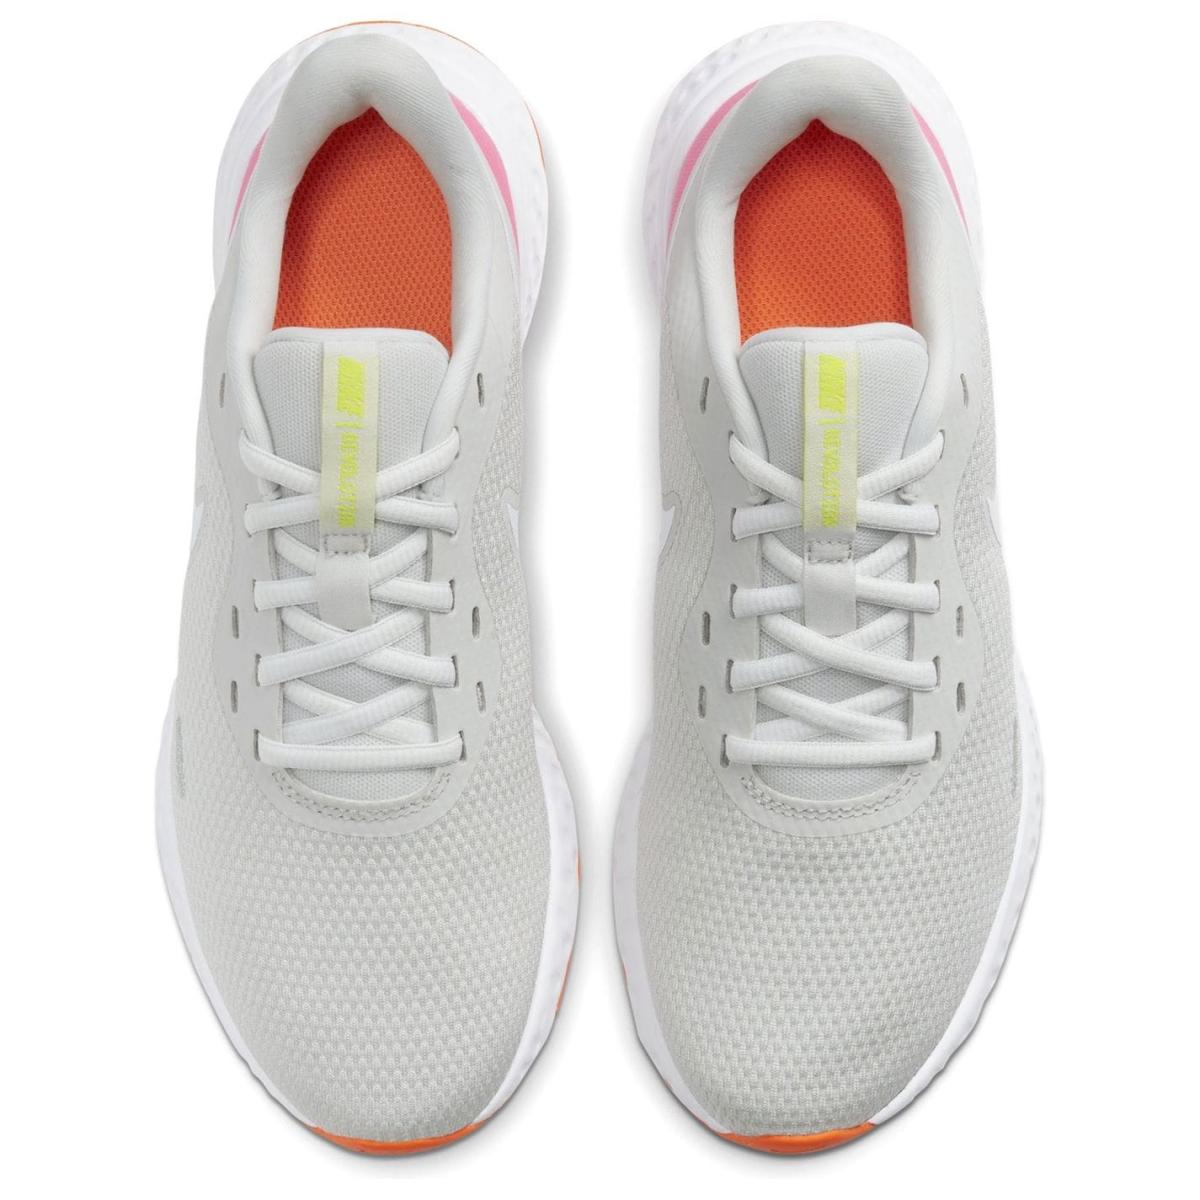 Nike-Revolution-Turnschuhe-Damen-Sneaker-Sportschuhe-Laufschuhe-1160 Indexbild 34